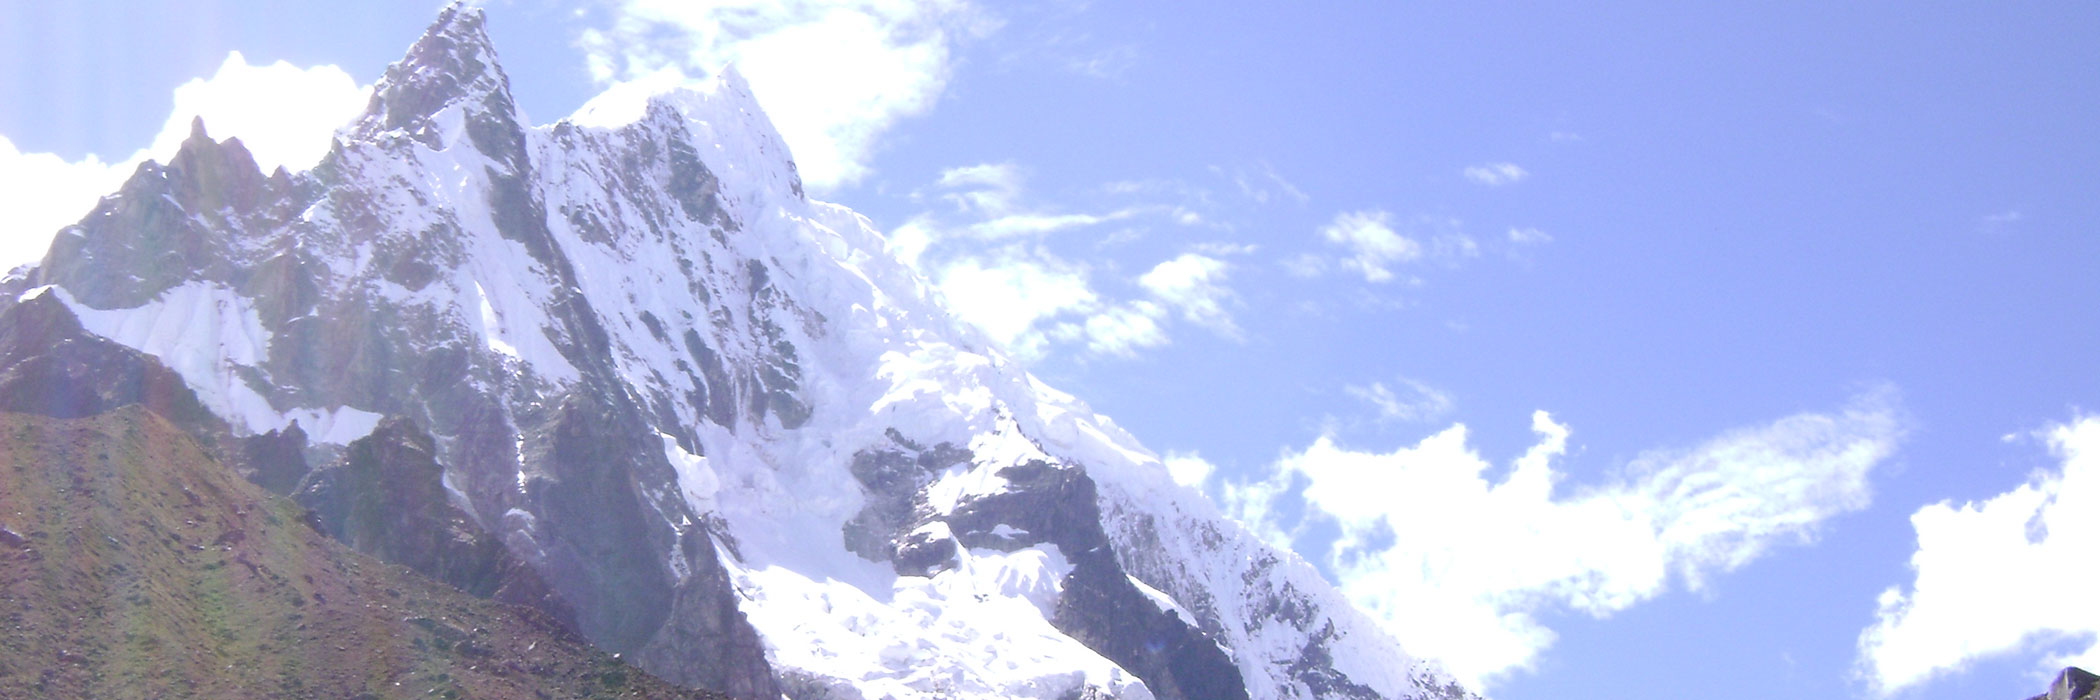 salkantay trek to machu picchu 6 days (1)